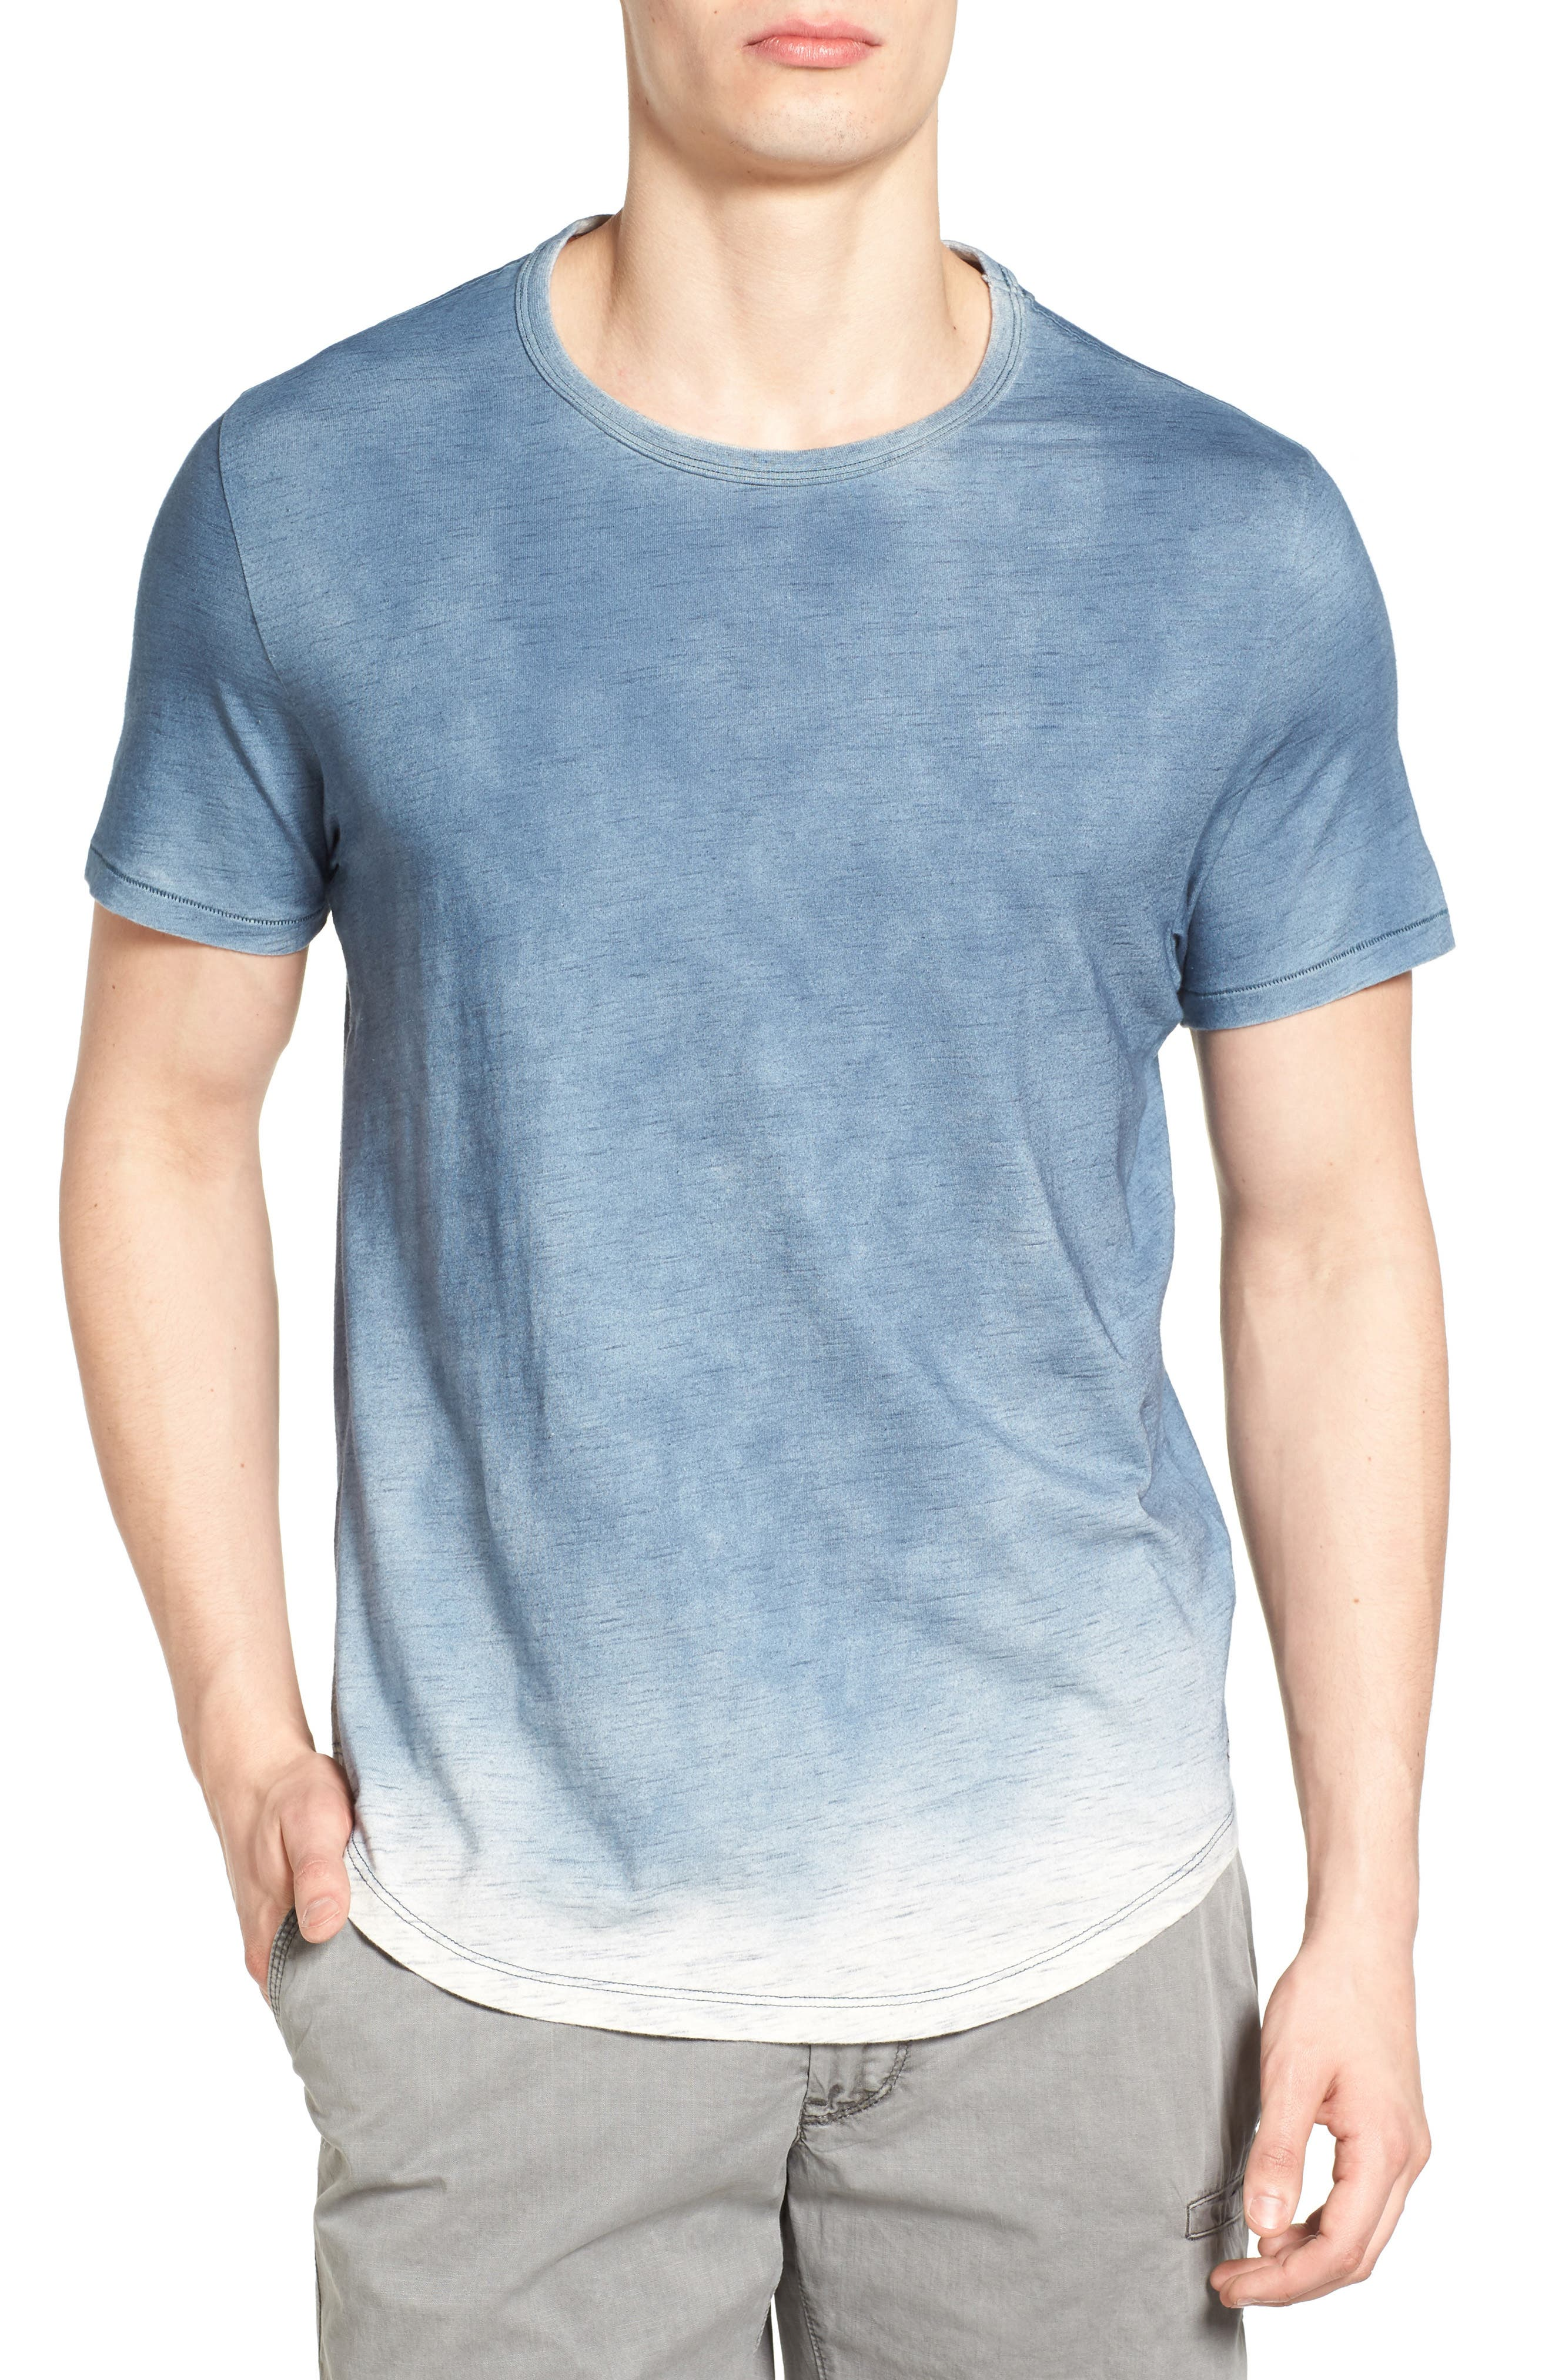 Main Image - Jeremiah Kendrick Spray Heather Jersey T-Shirt